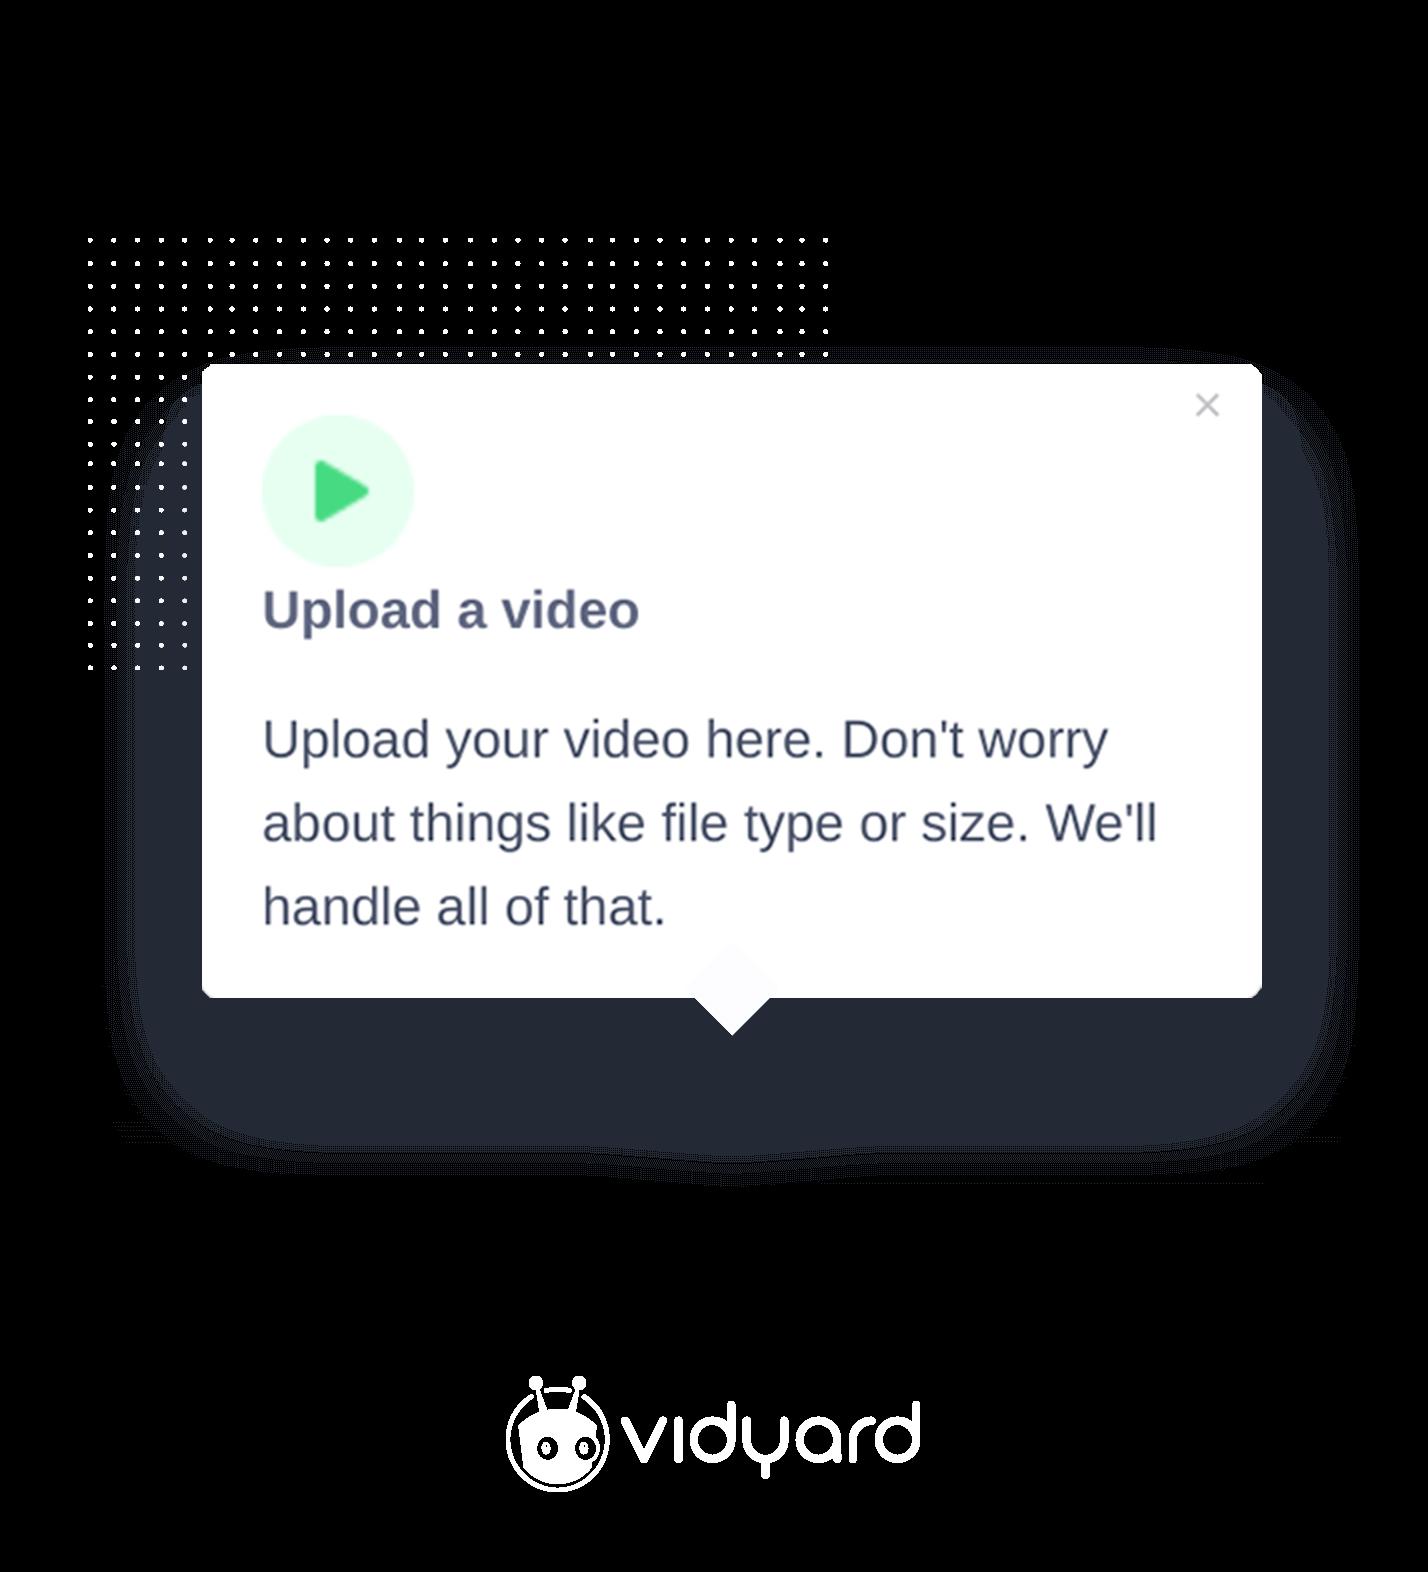 Vidyard tooltip created using Appcues